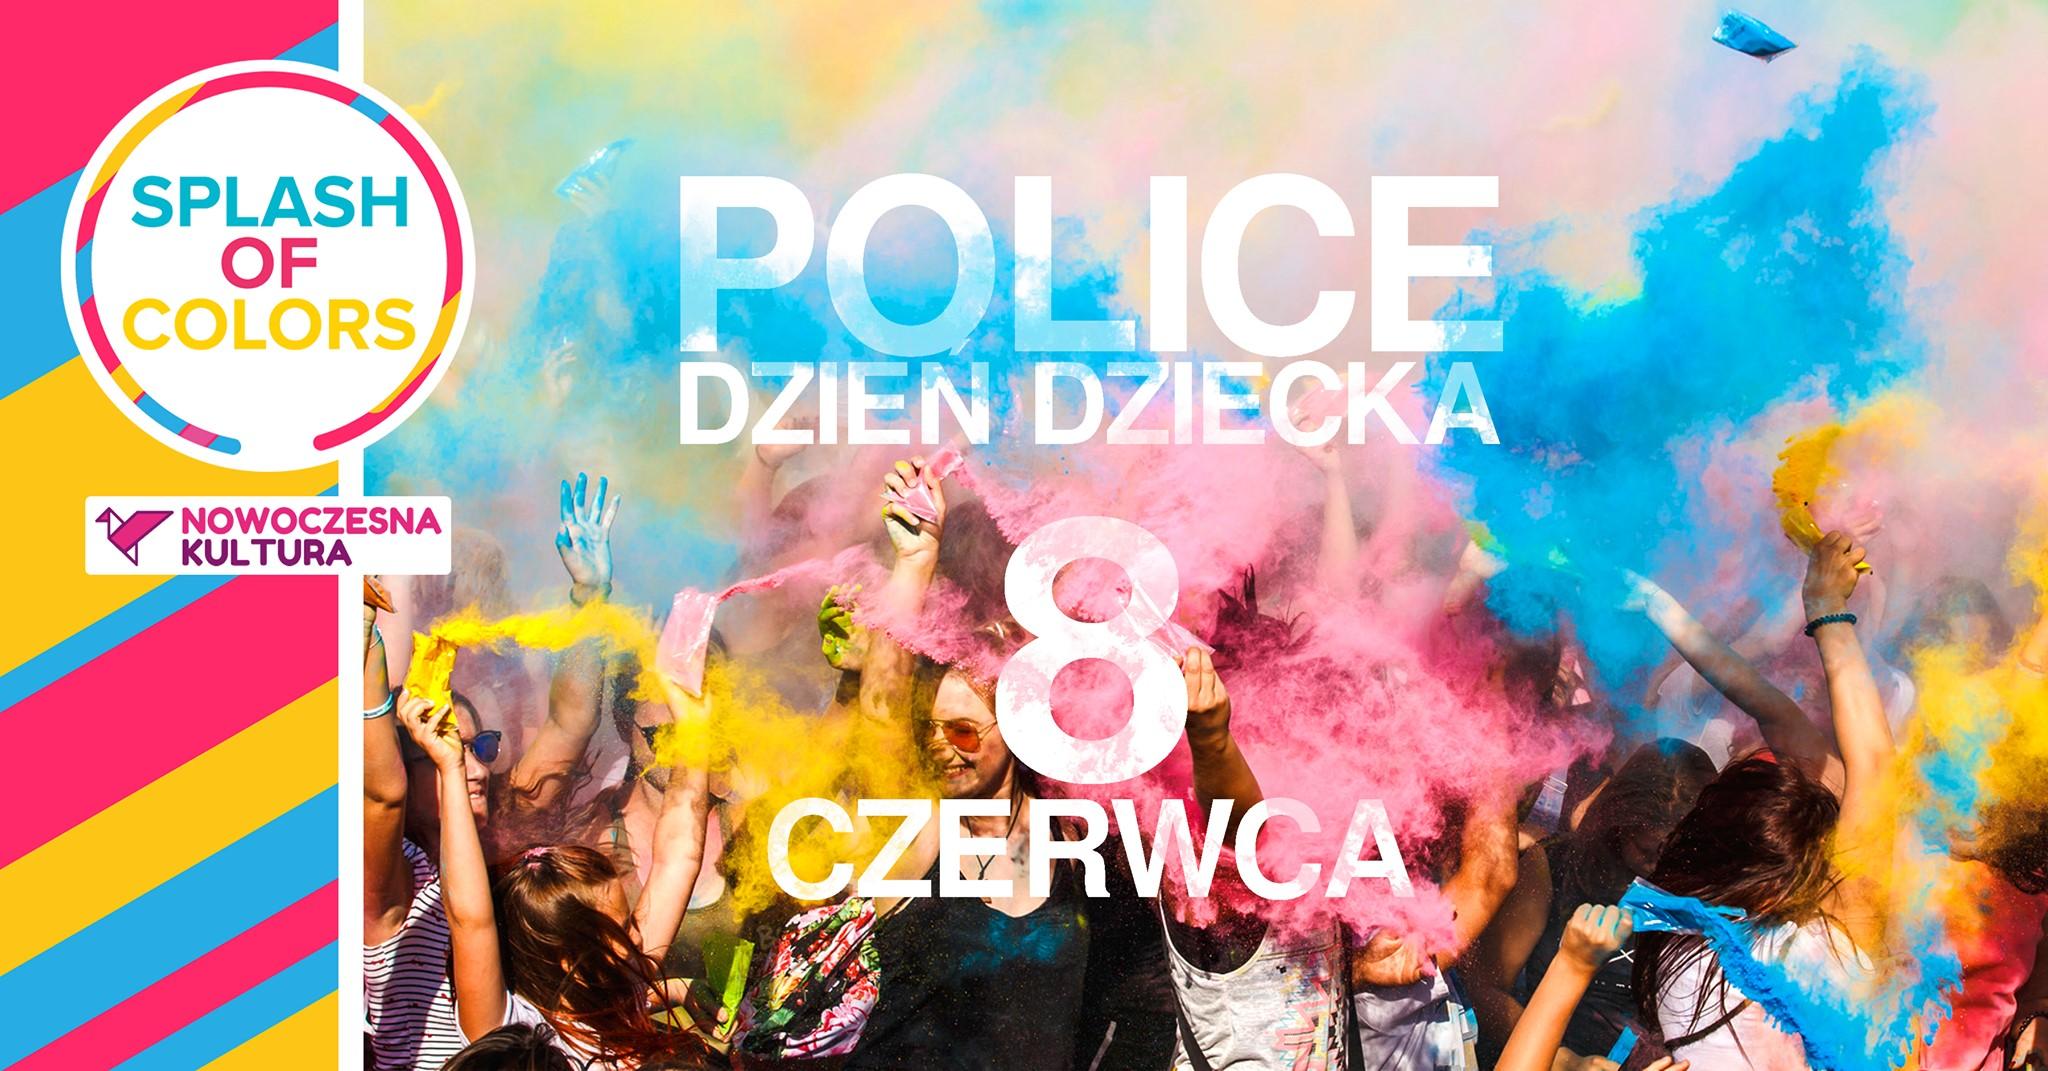 Splash of Colors - Święto Kolorów Holi